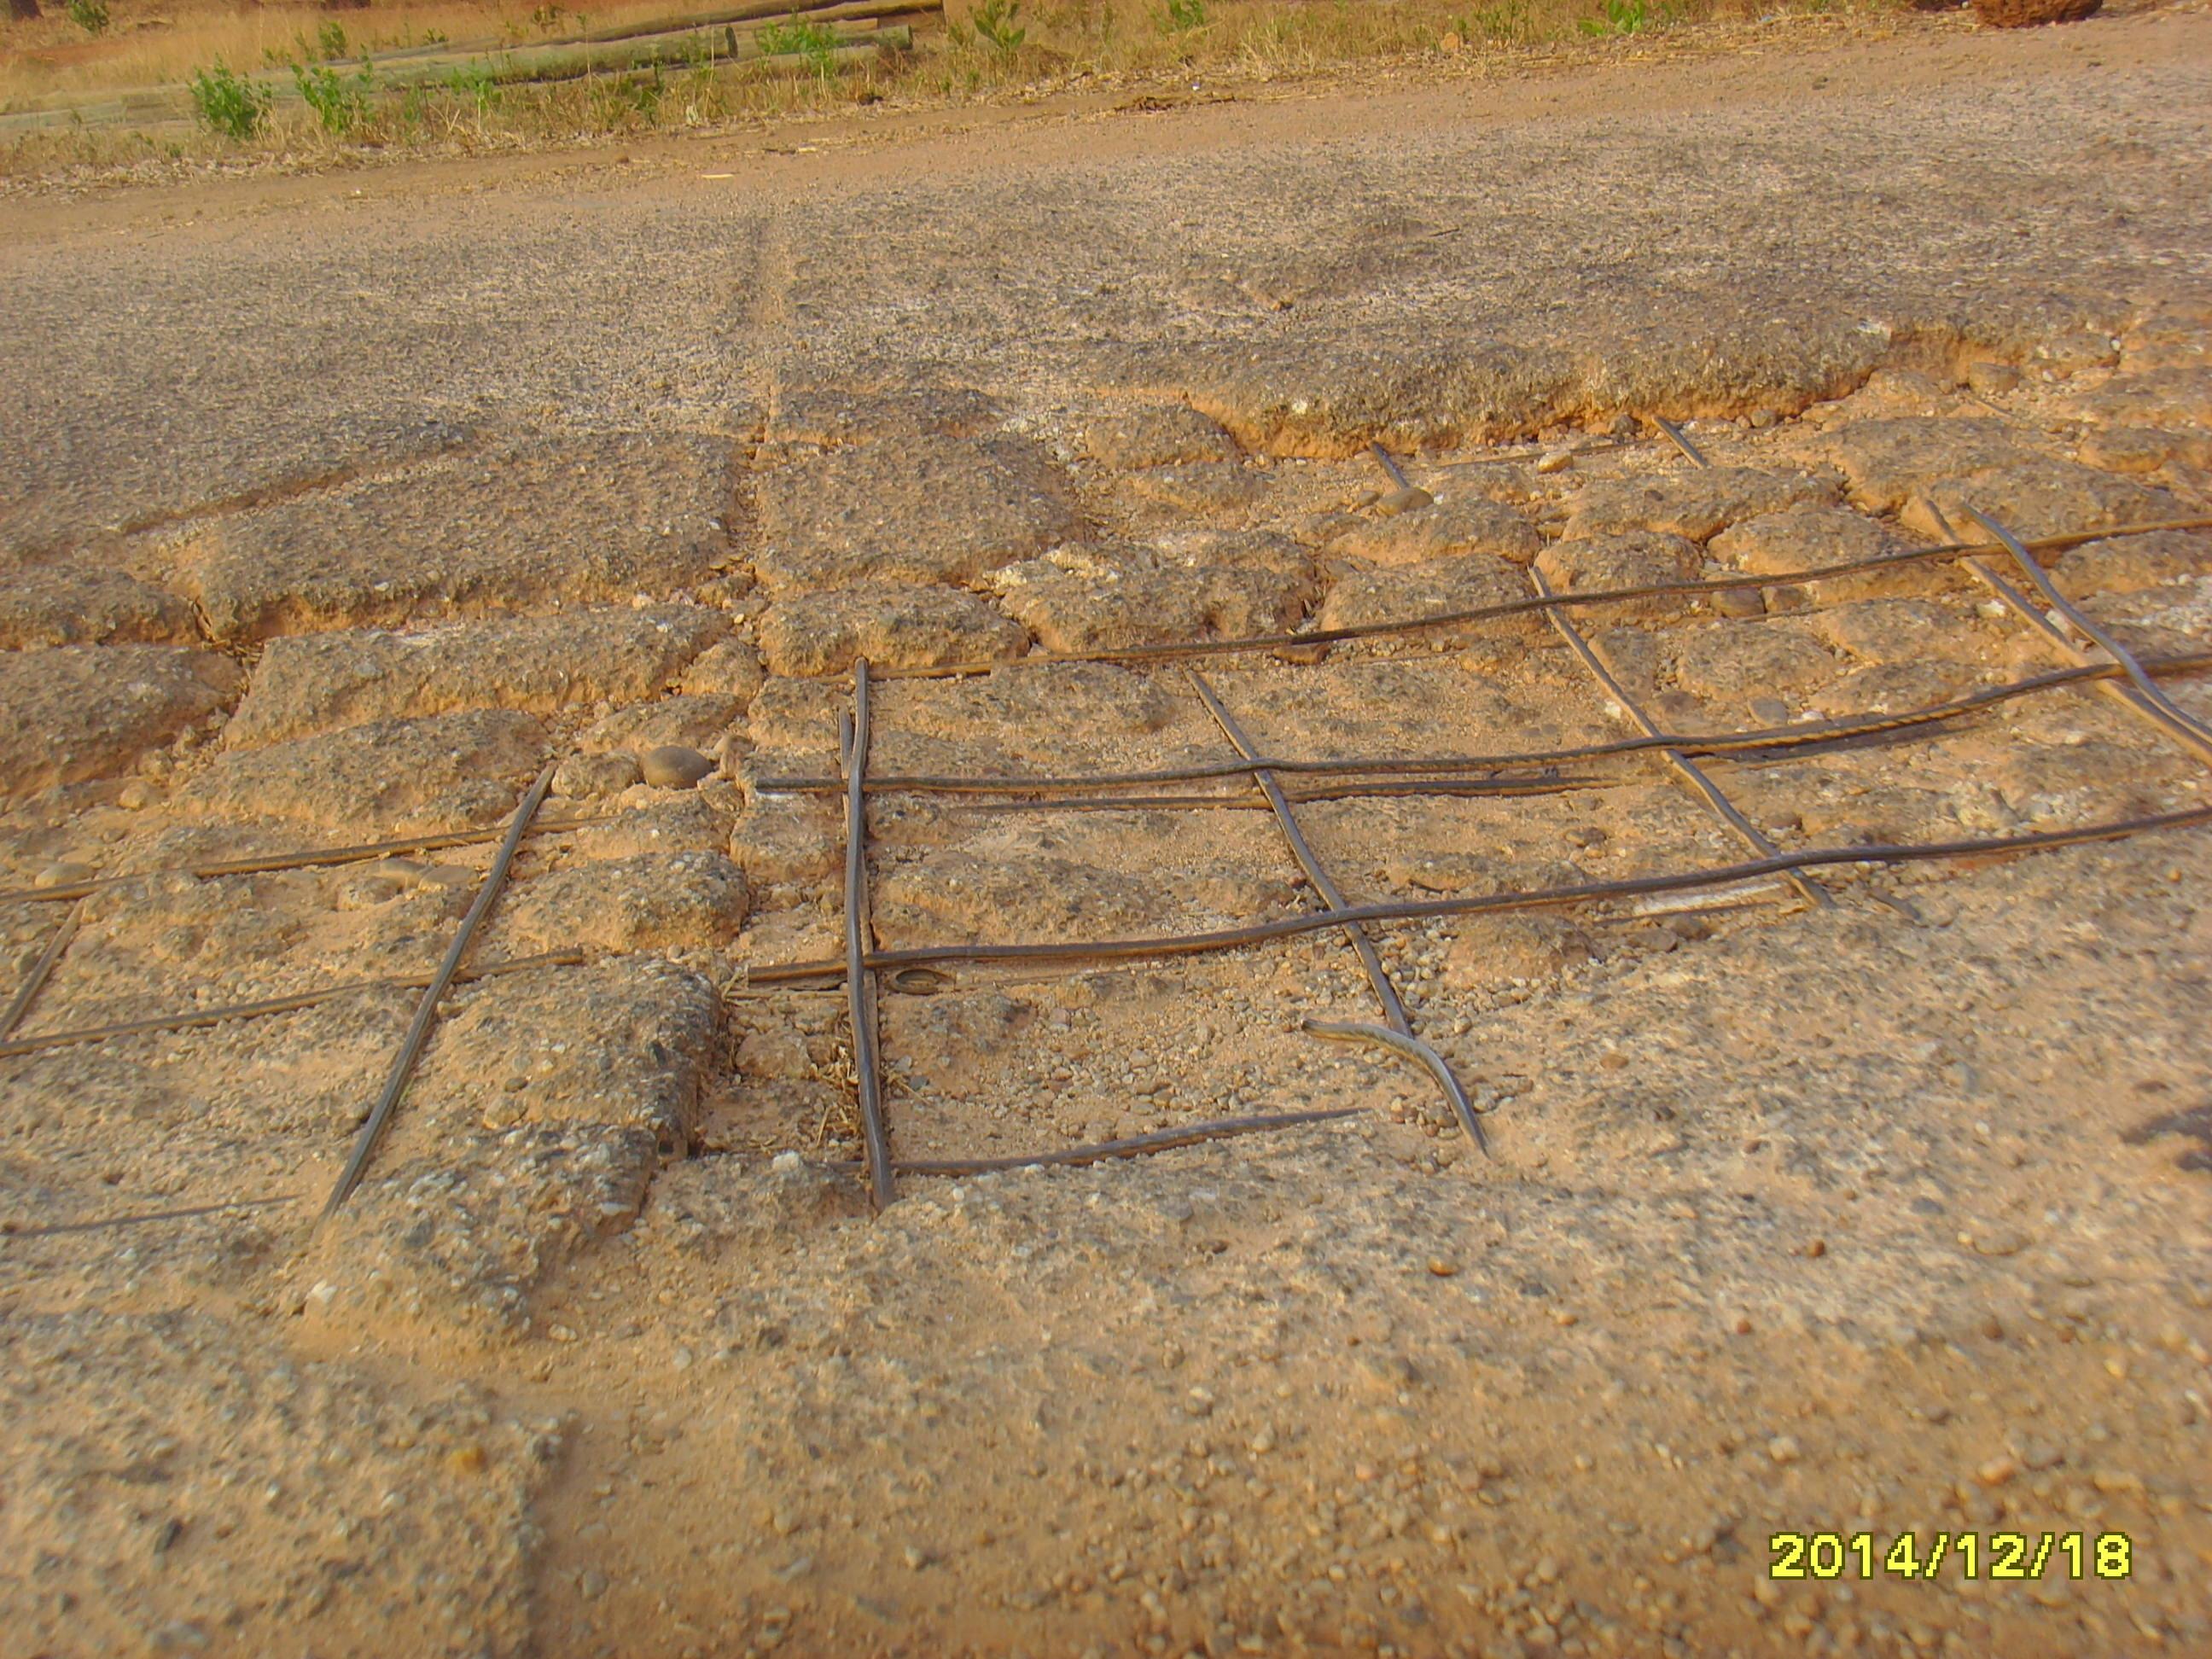 exposed iron rods